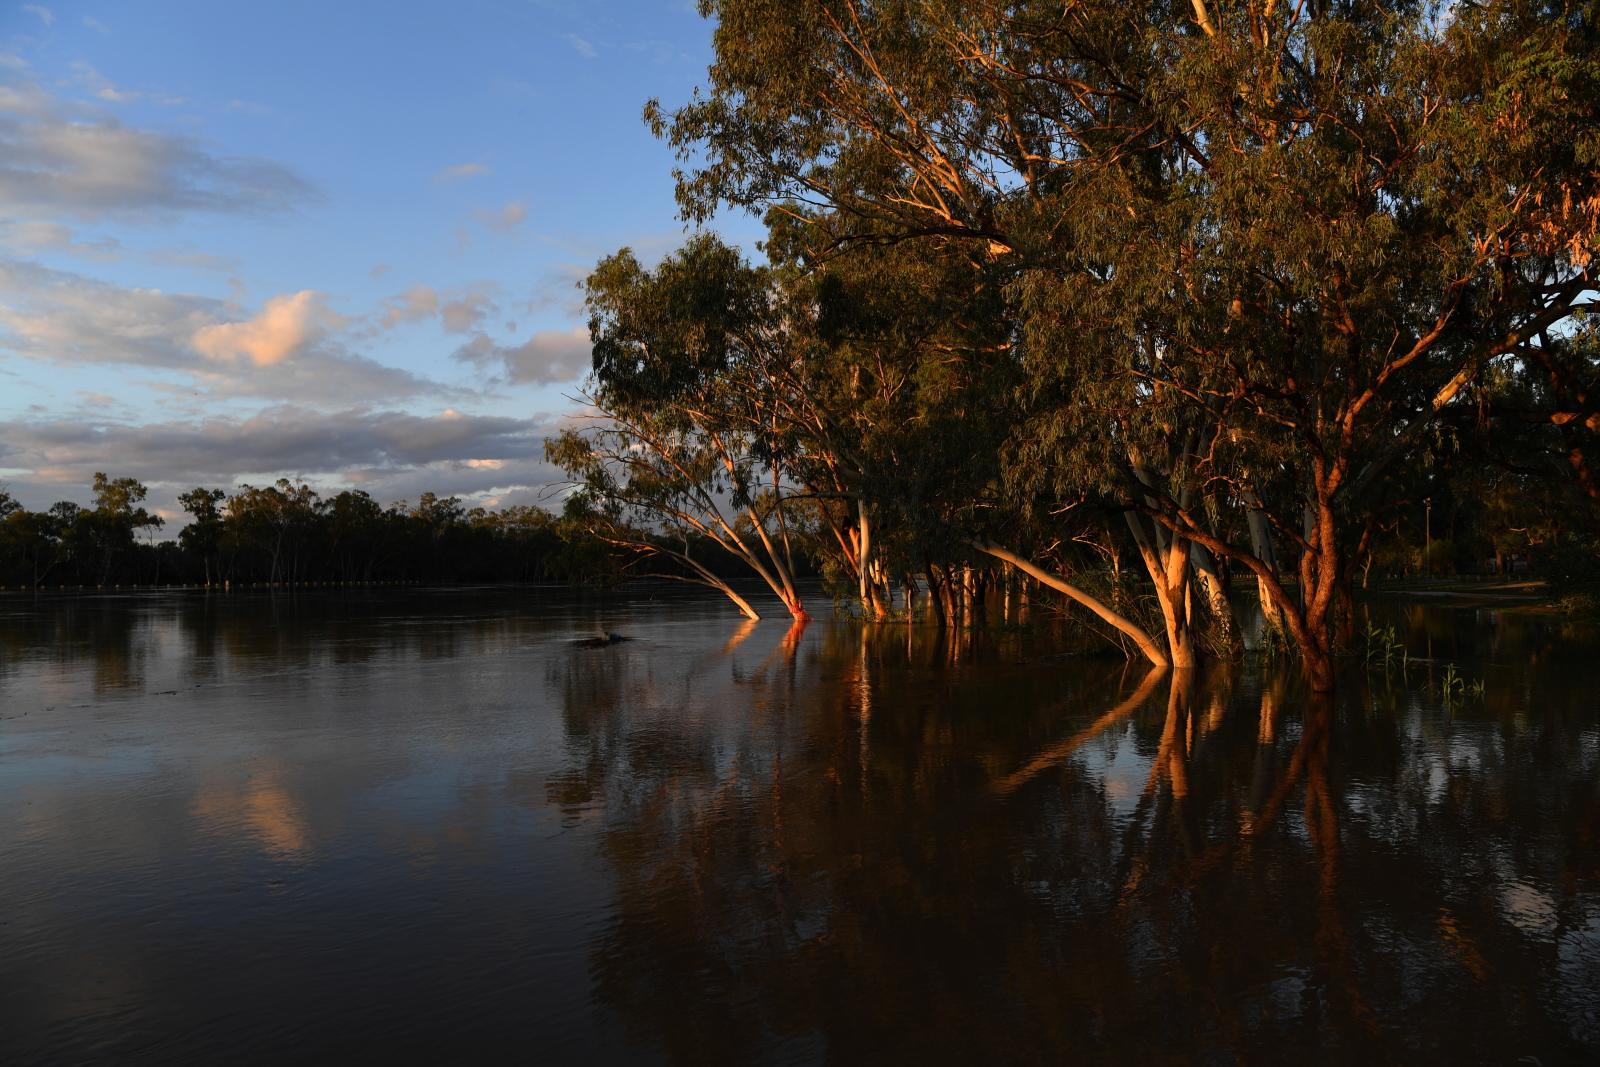 Powódź na wyspie fot. EPA/DAN PELED AUSTRALIA AND NEW ZEALAND OUT